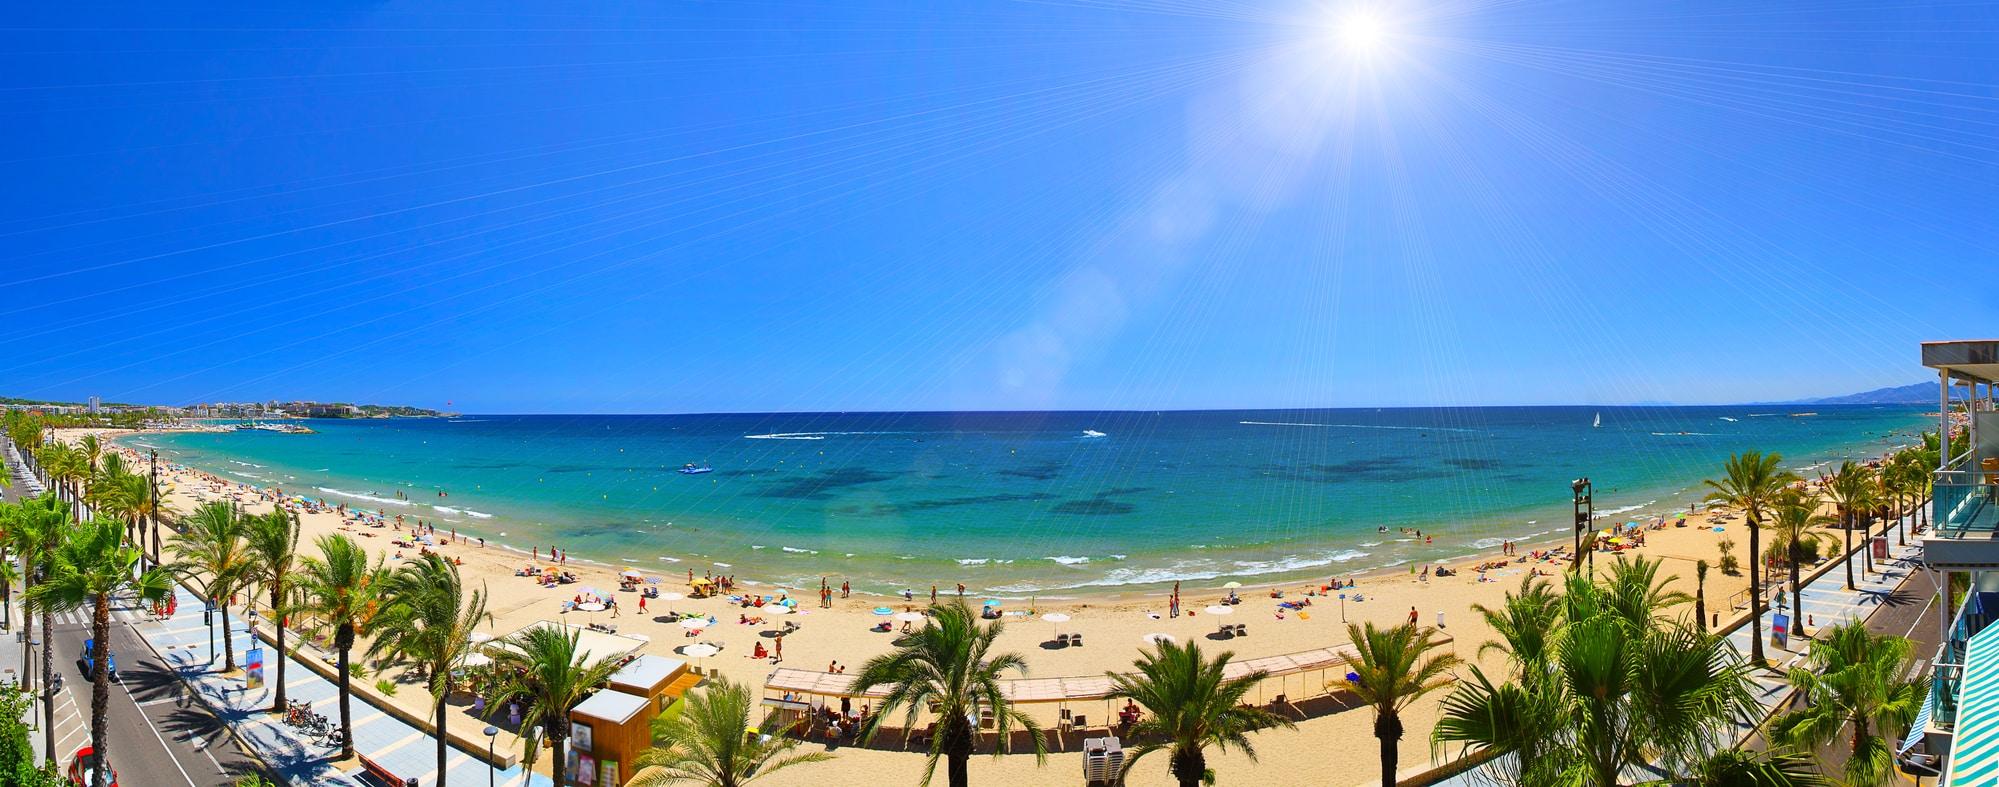 Glamping med Vacanceselect. Platja Llarga beach in Salou, Costa Brava, Spain